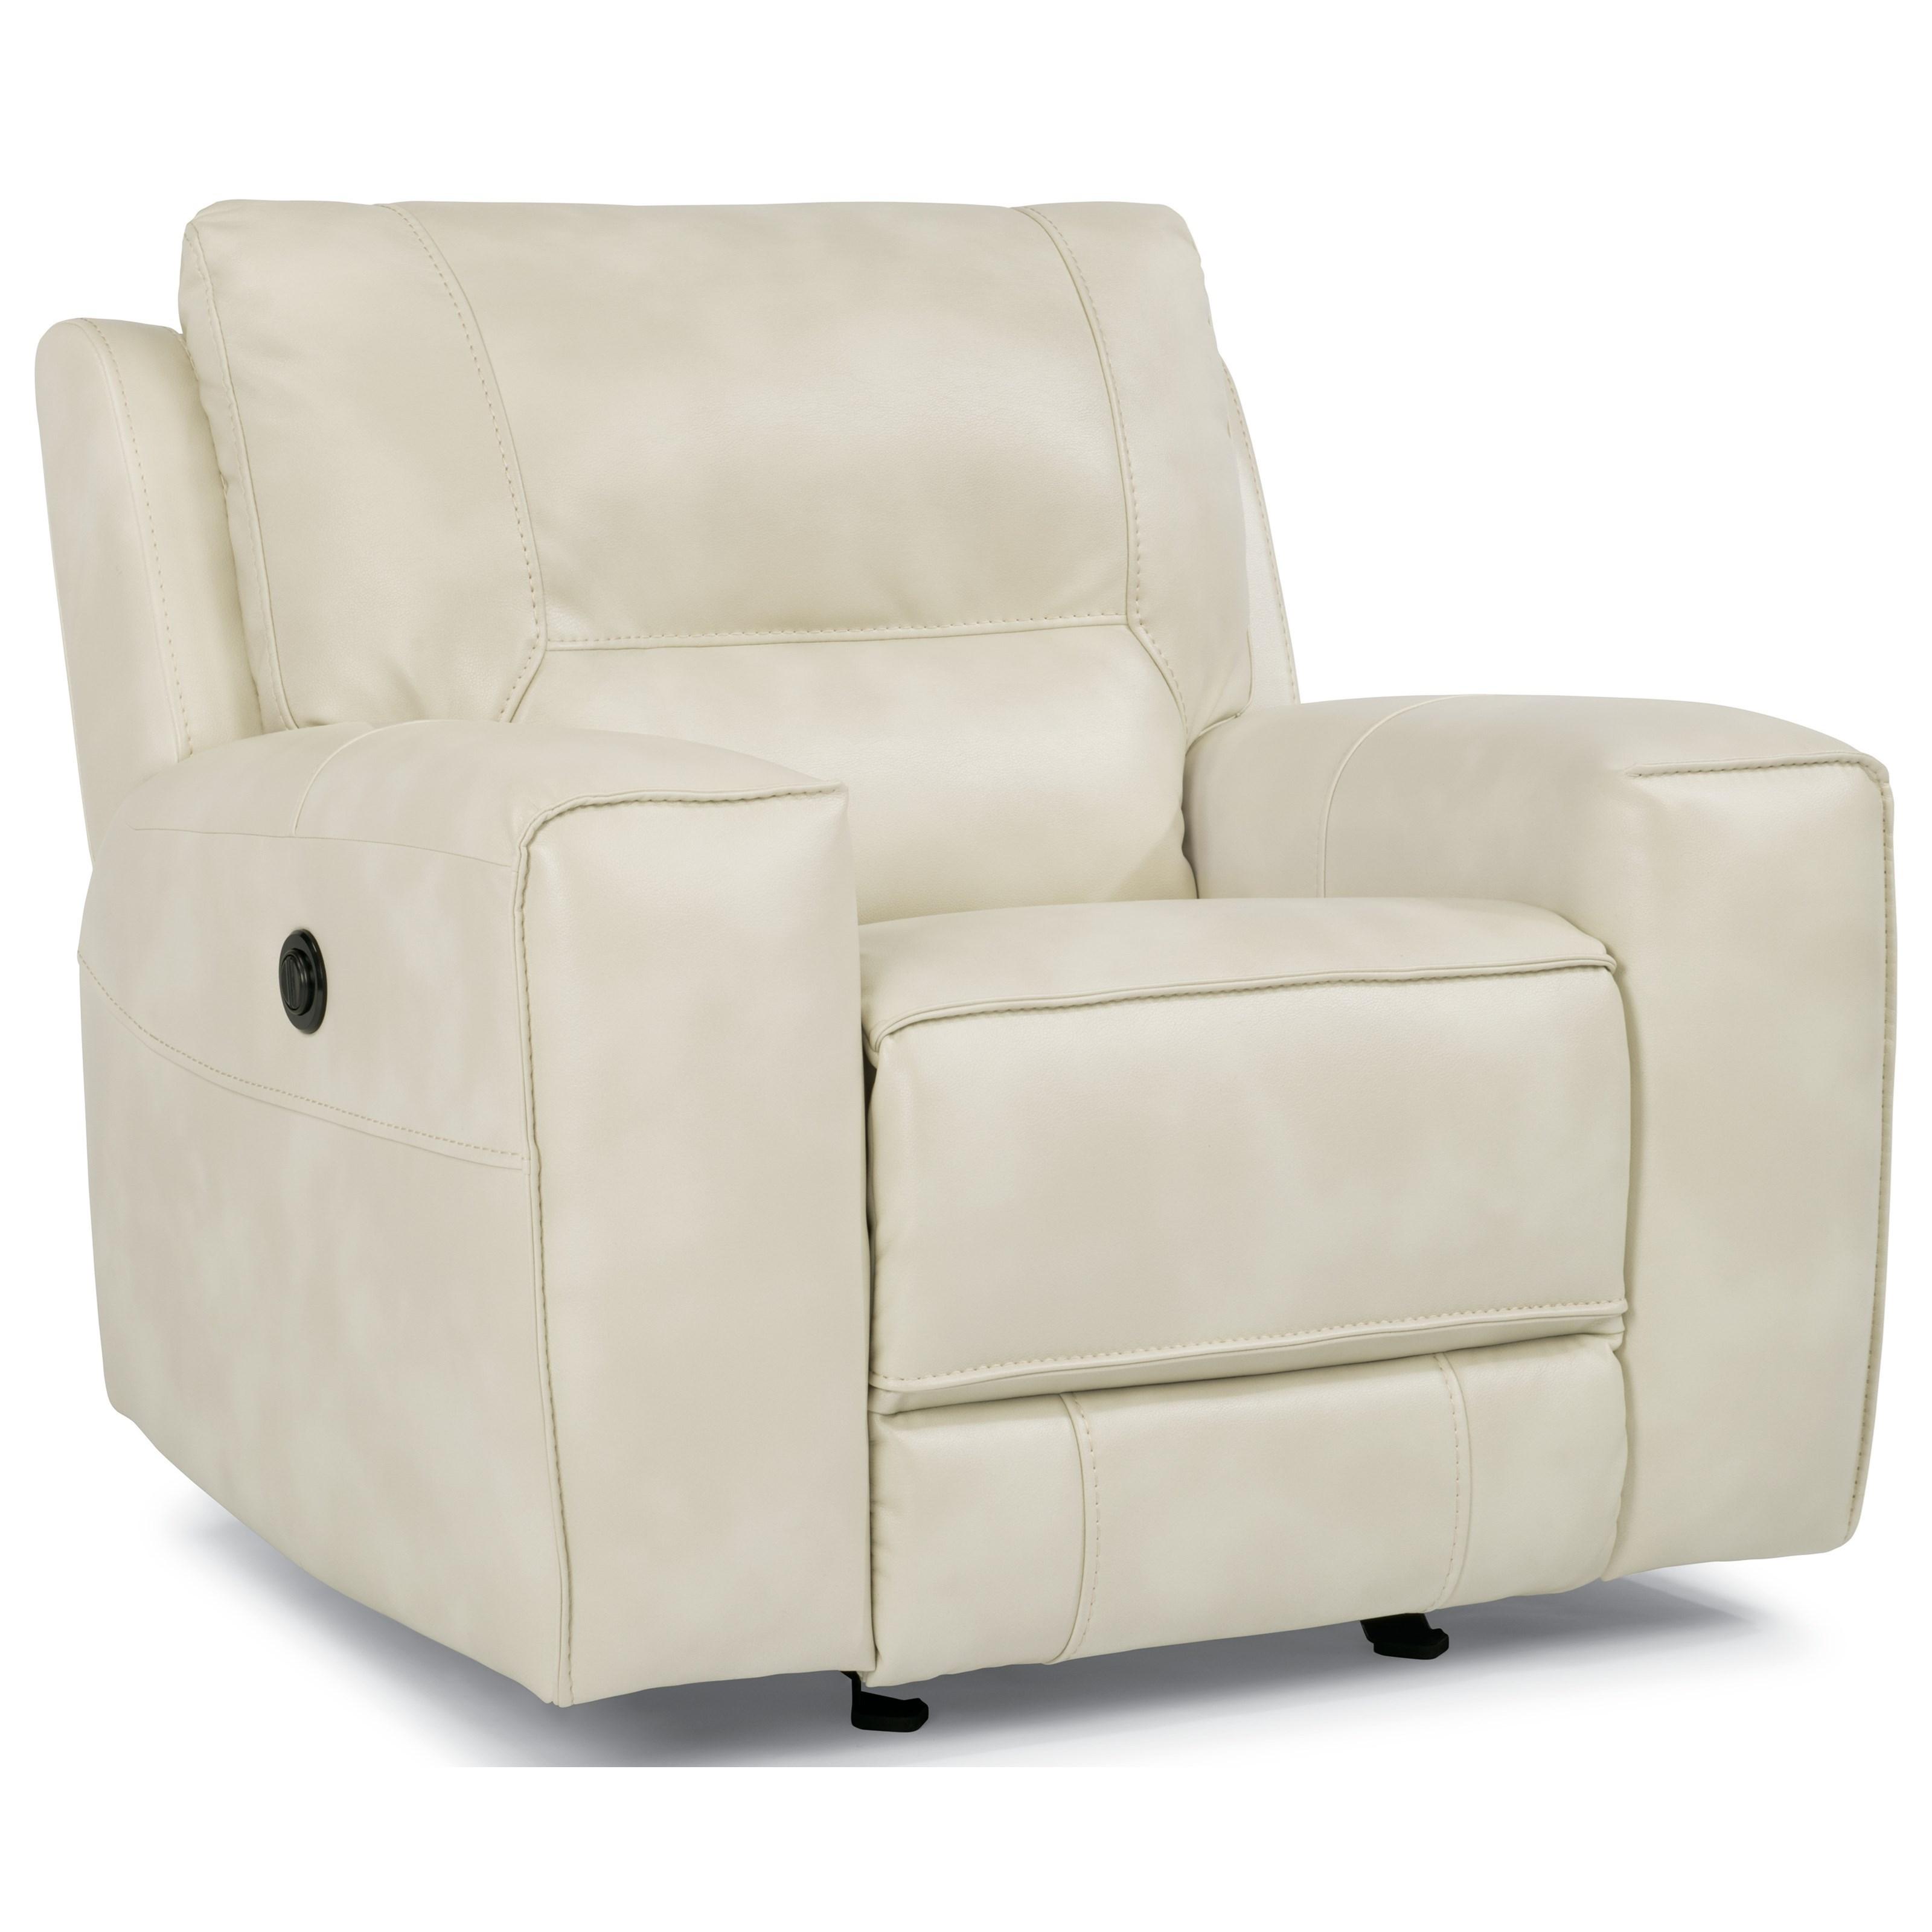 Flexsteel Latitudes-Molino Power Reclining Chair - Item Number: 1756-54P